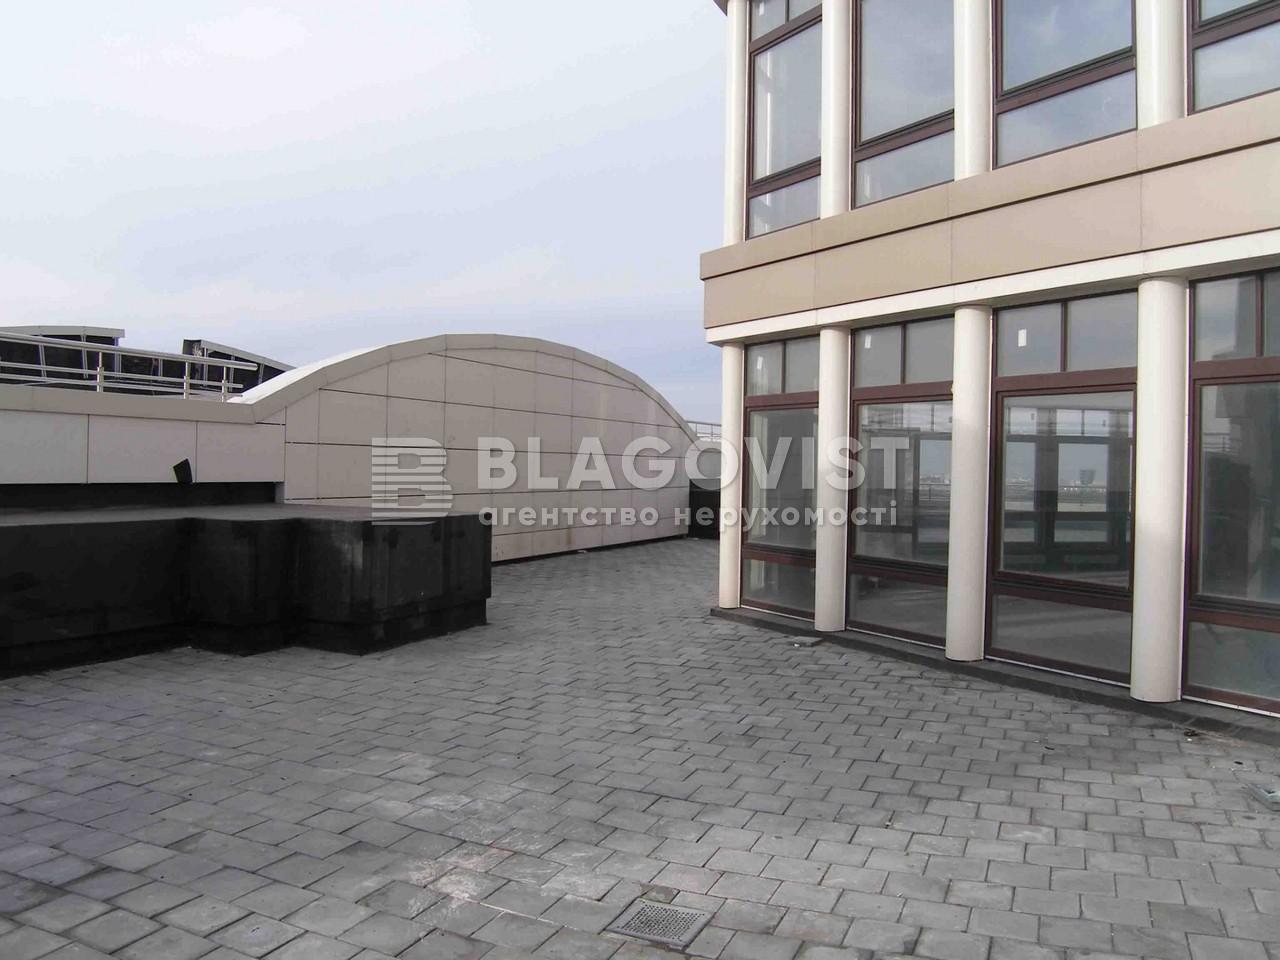 Квартира H-12557, Грушевского Михаила, 9а, Киев - Фото 12